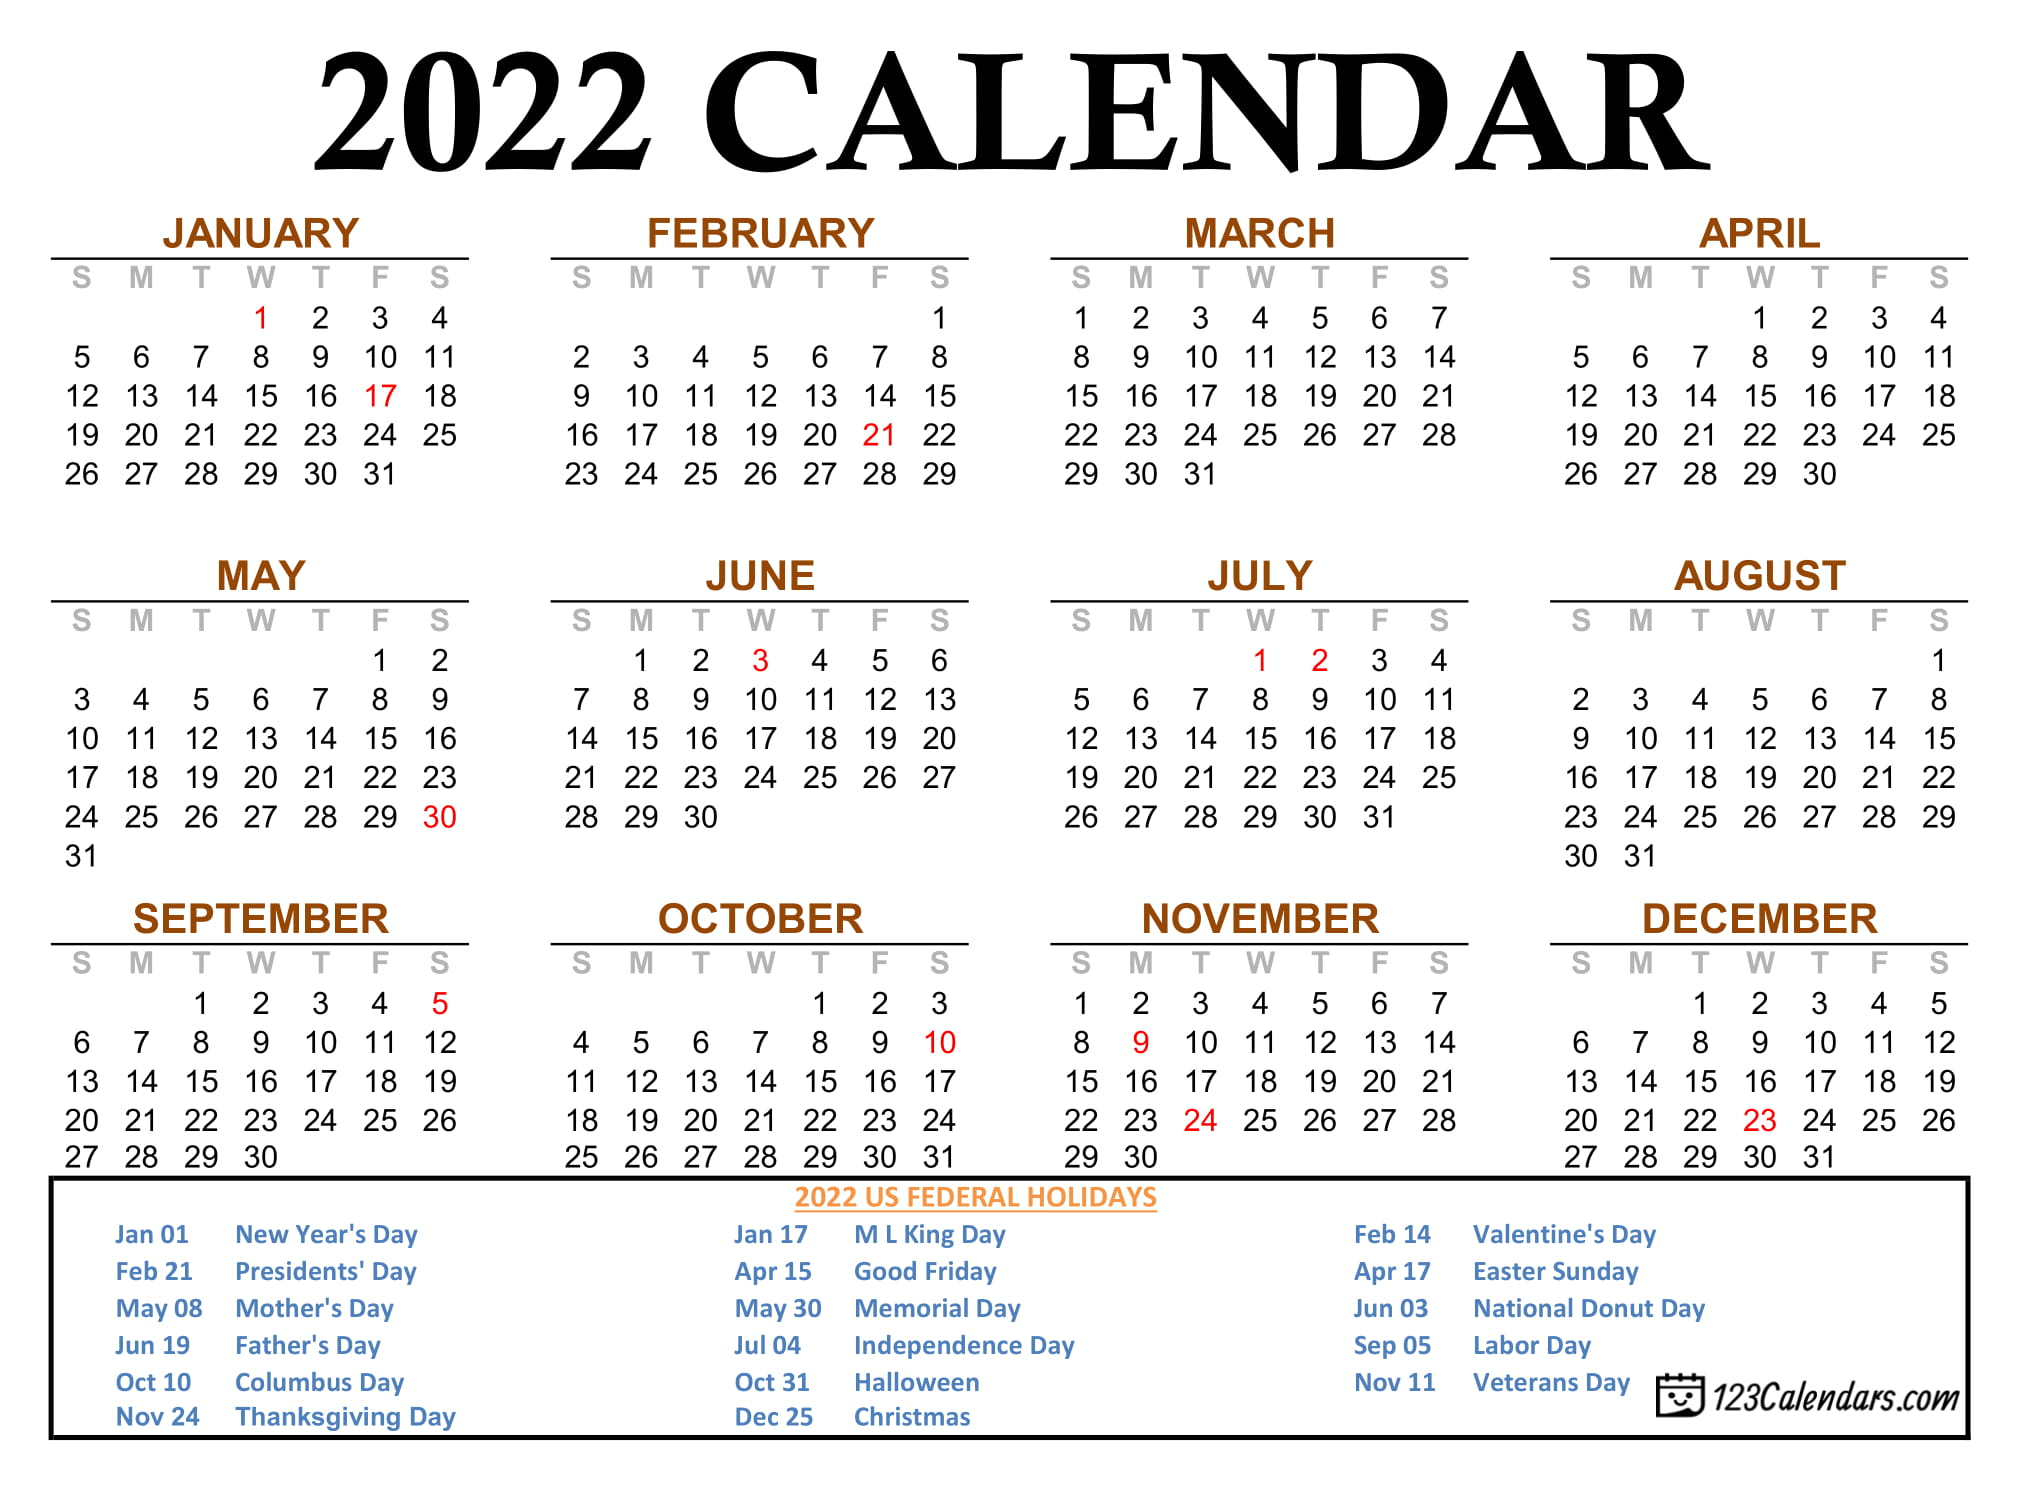 2022 2023 Calendar.Year 2022 Calendar Templates 123calendars Com